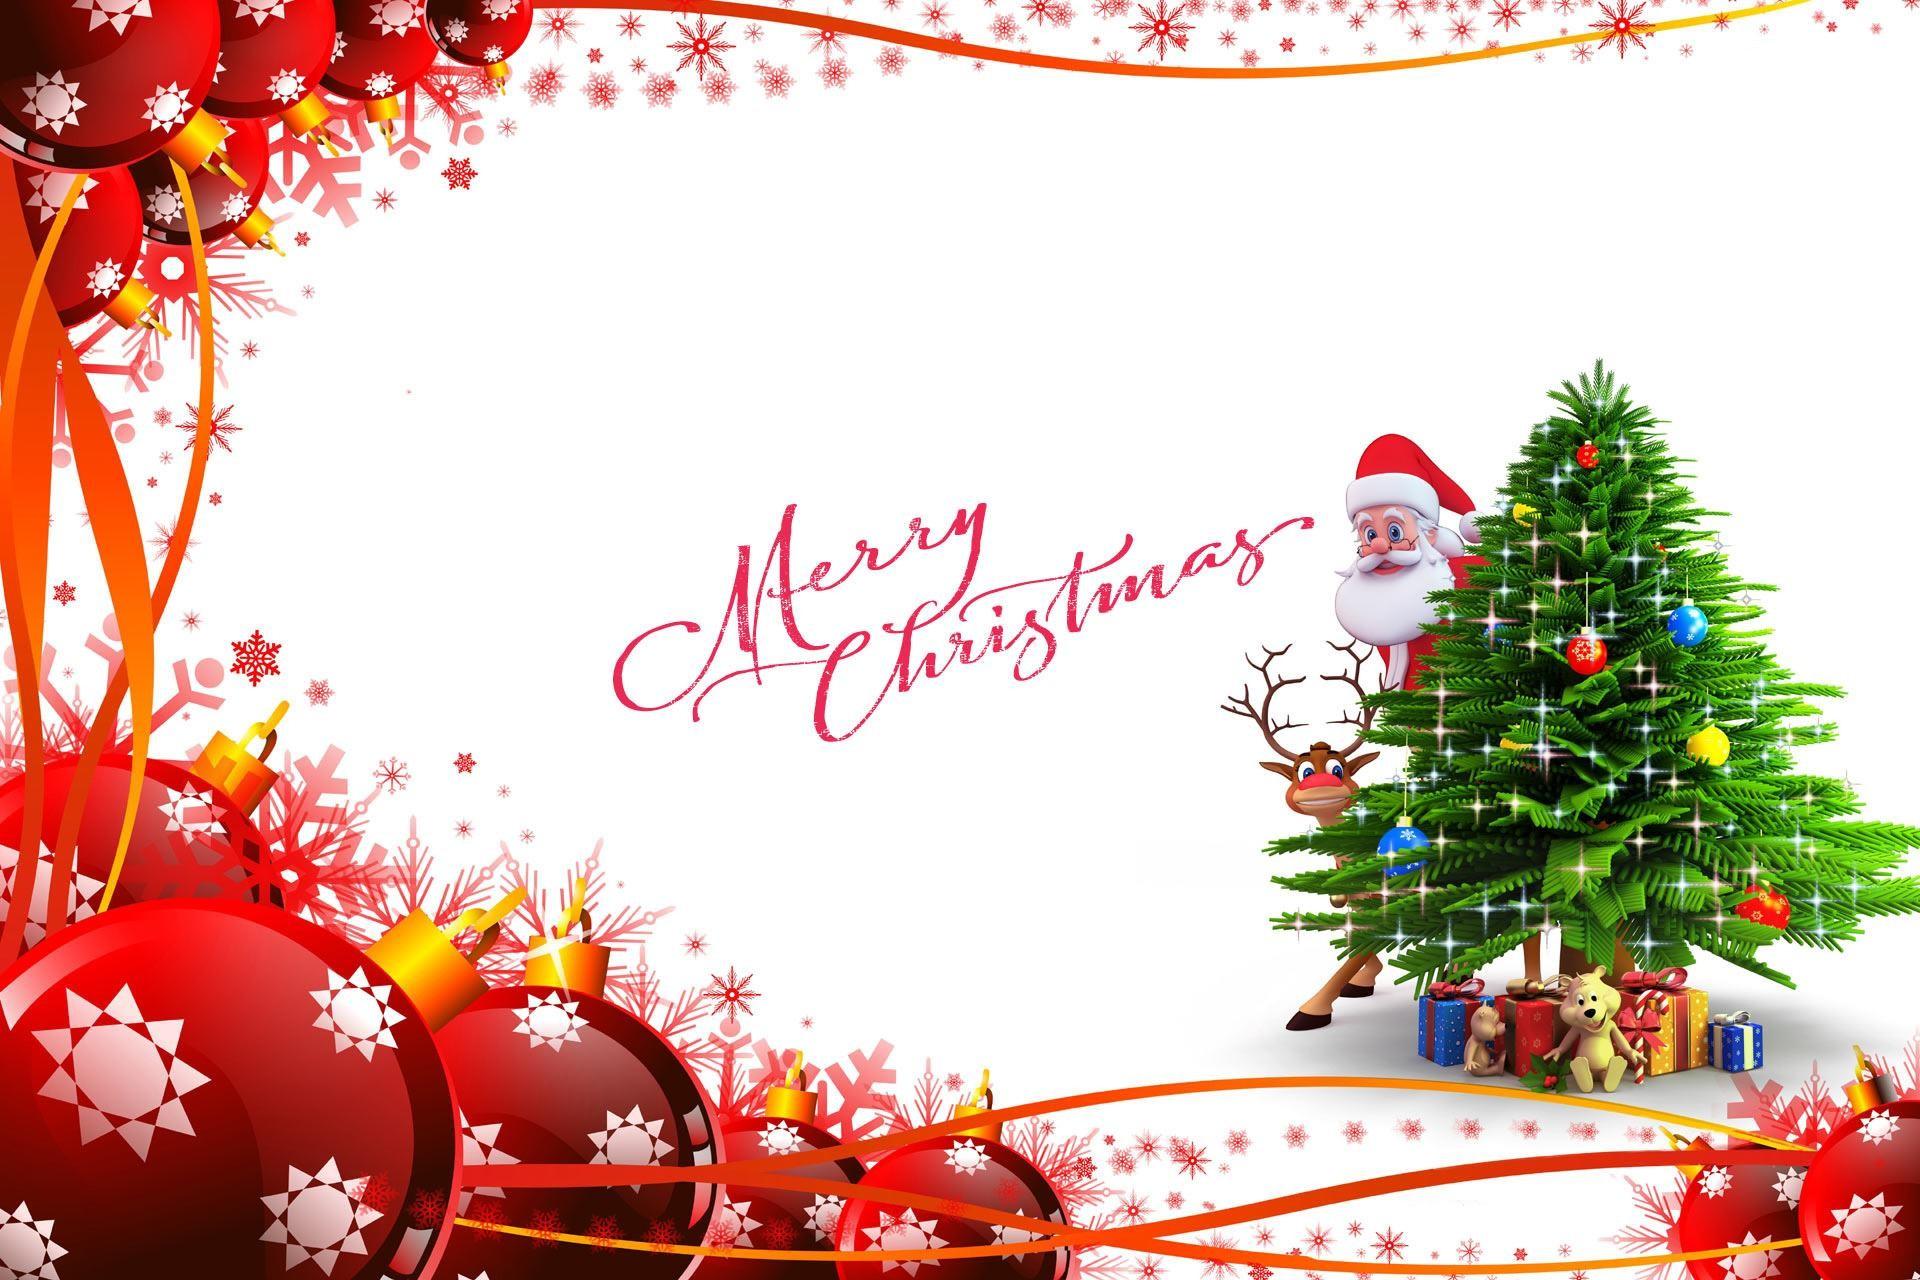 Beauty Christmas HD wallpapers